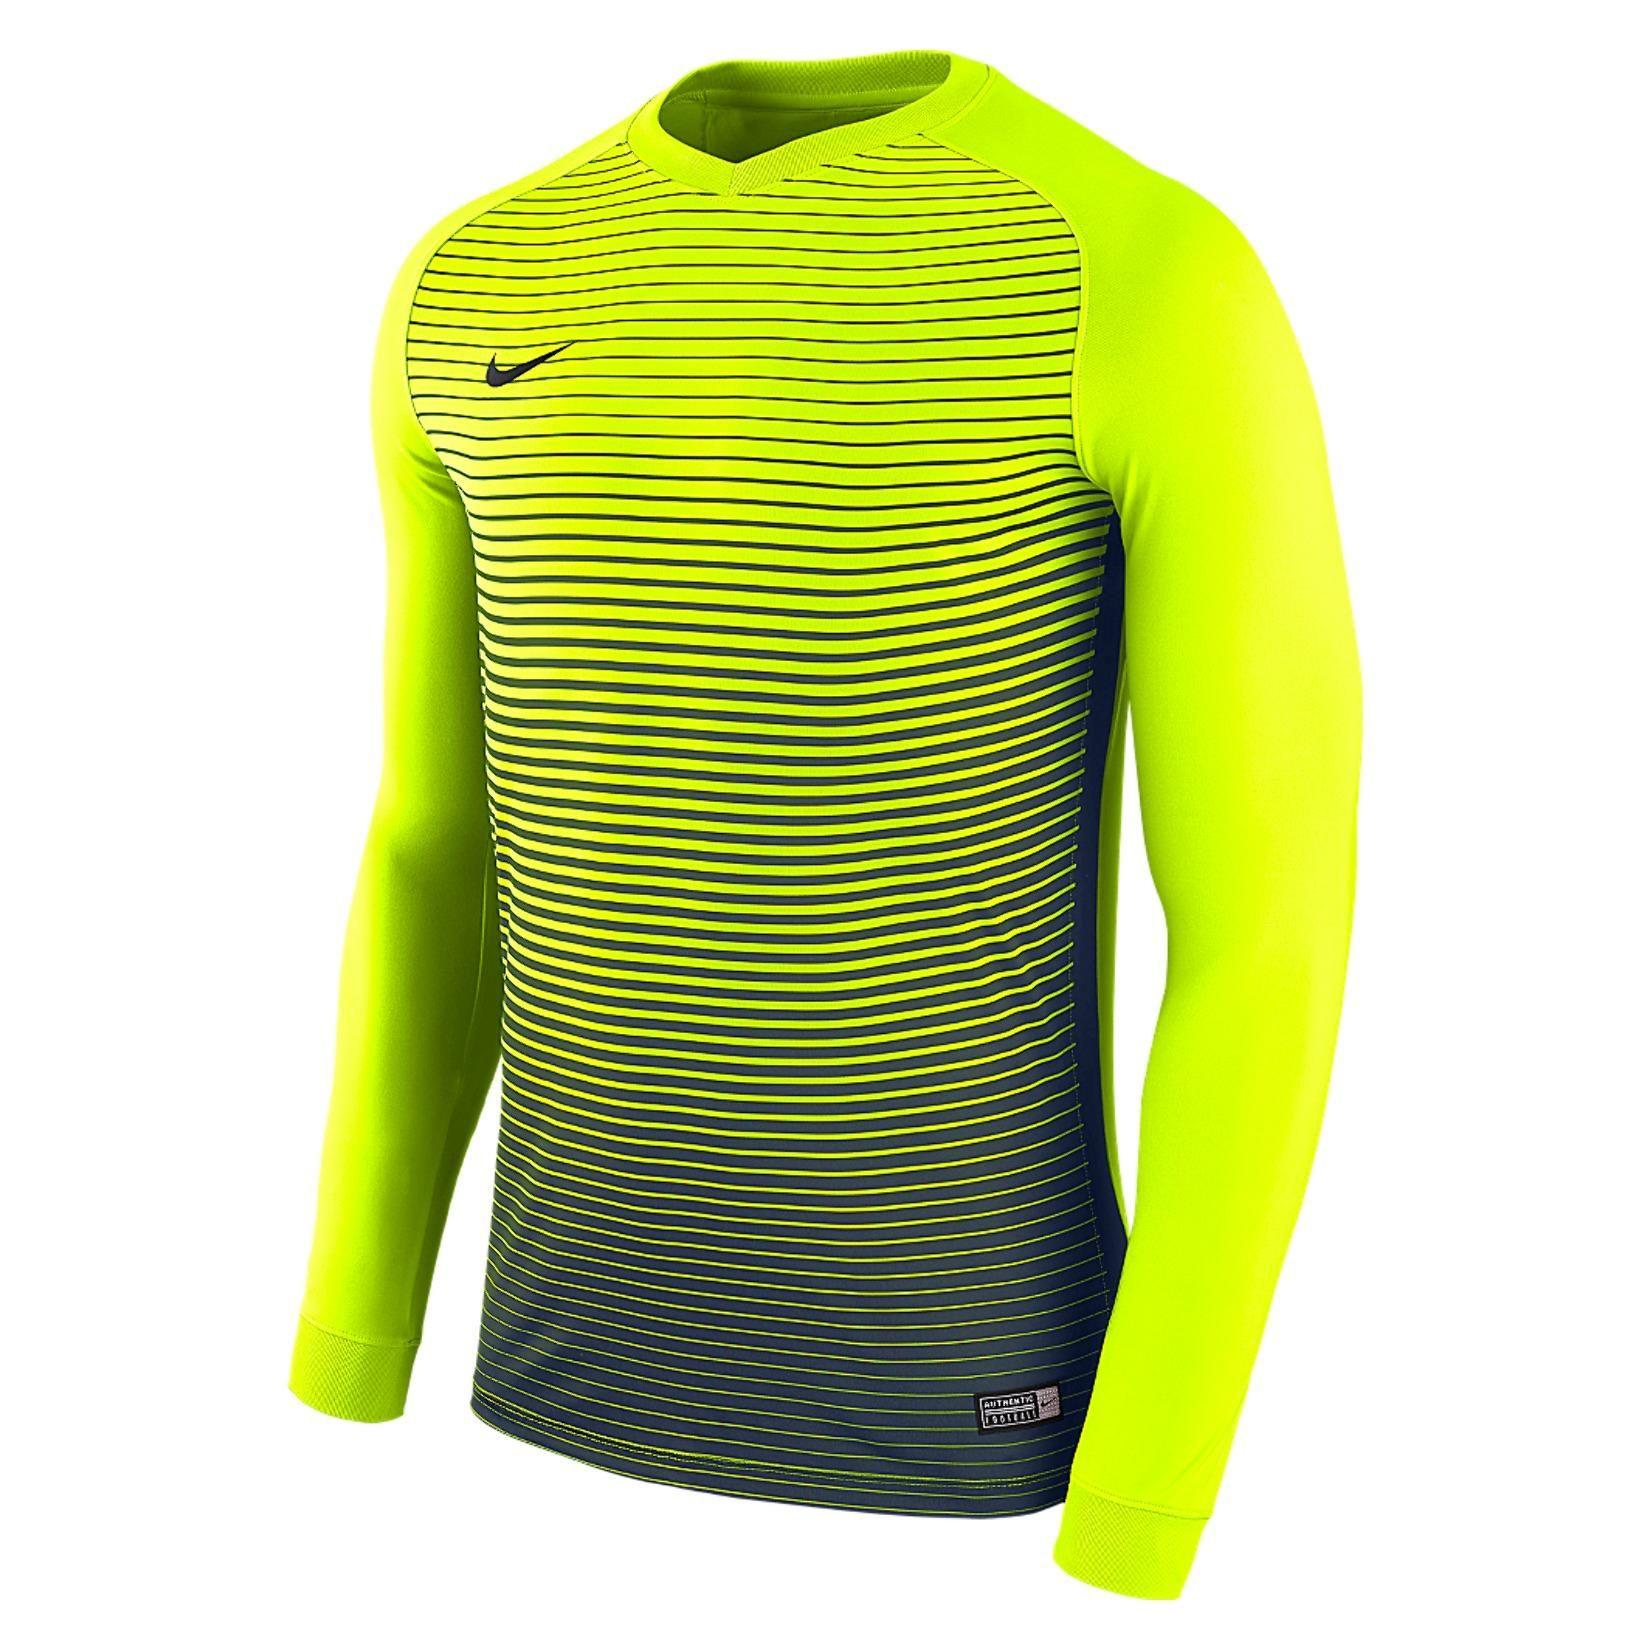 b8ef9671 Nike Precision Iv Long Sleeve Football Shirt | FUTSAL KIT | Football ...